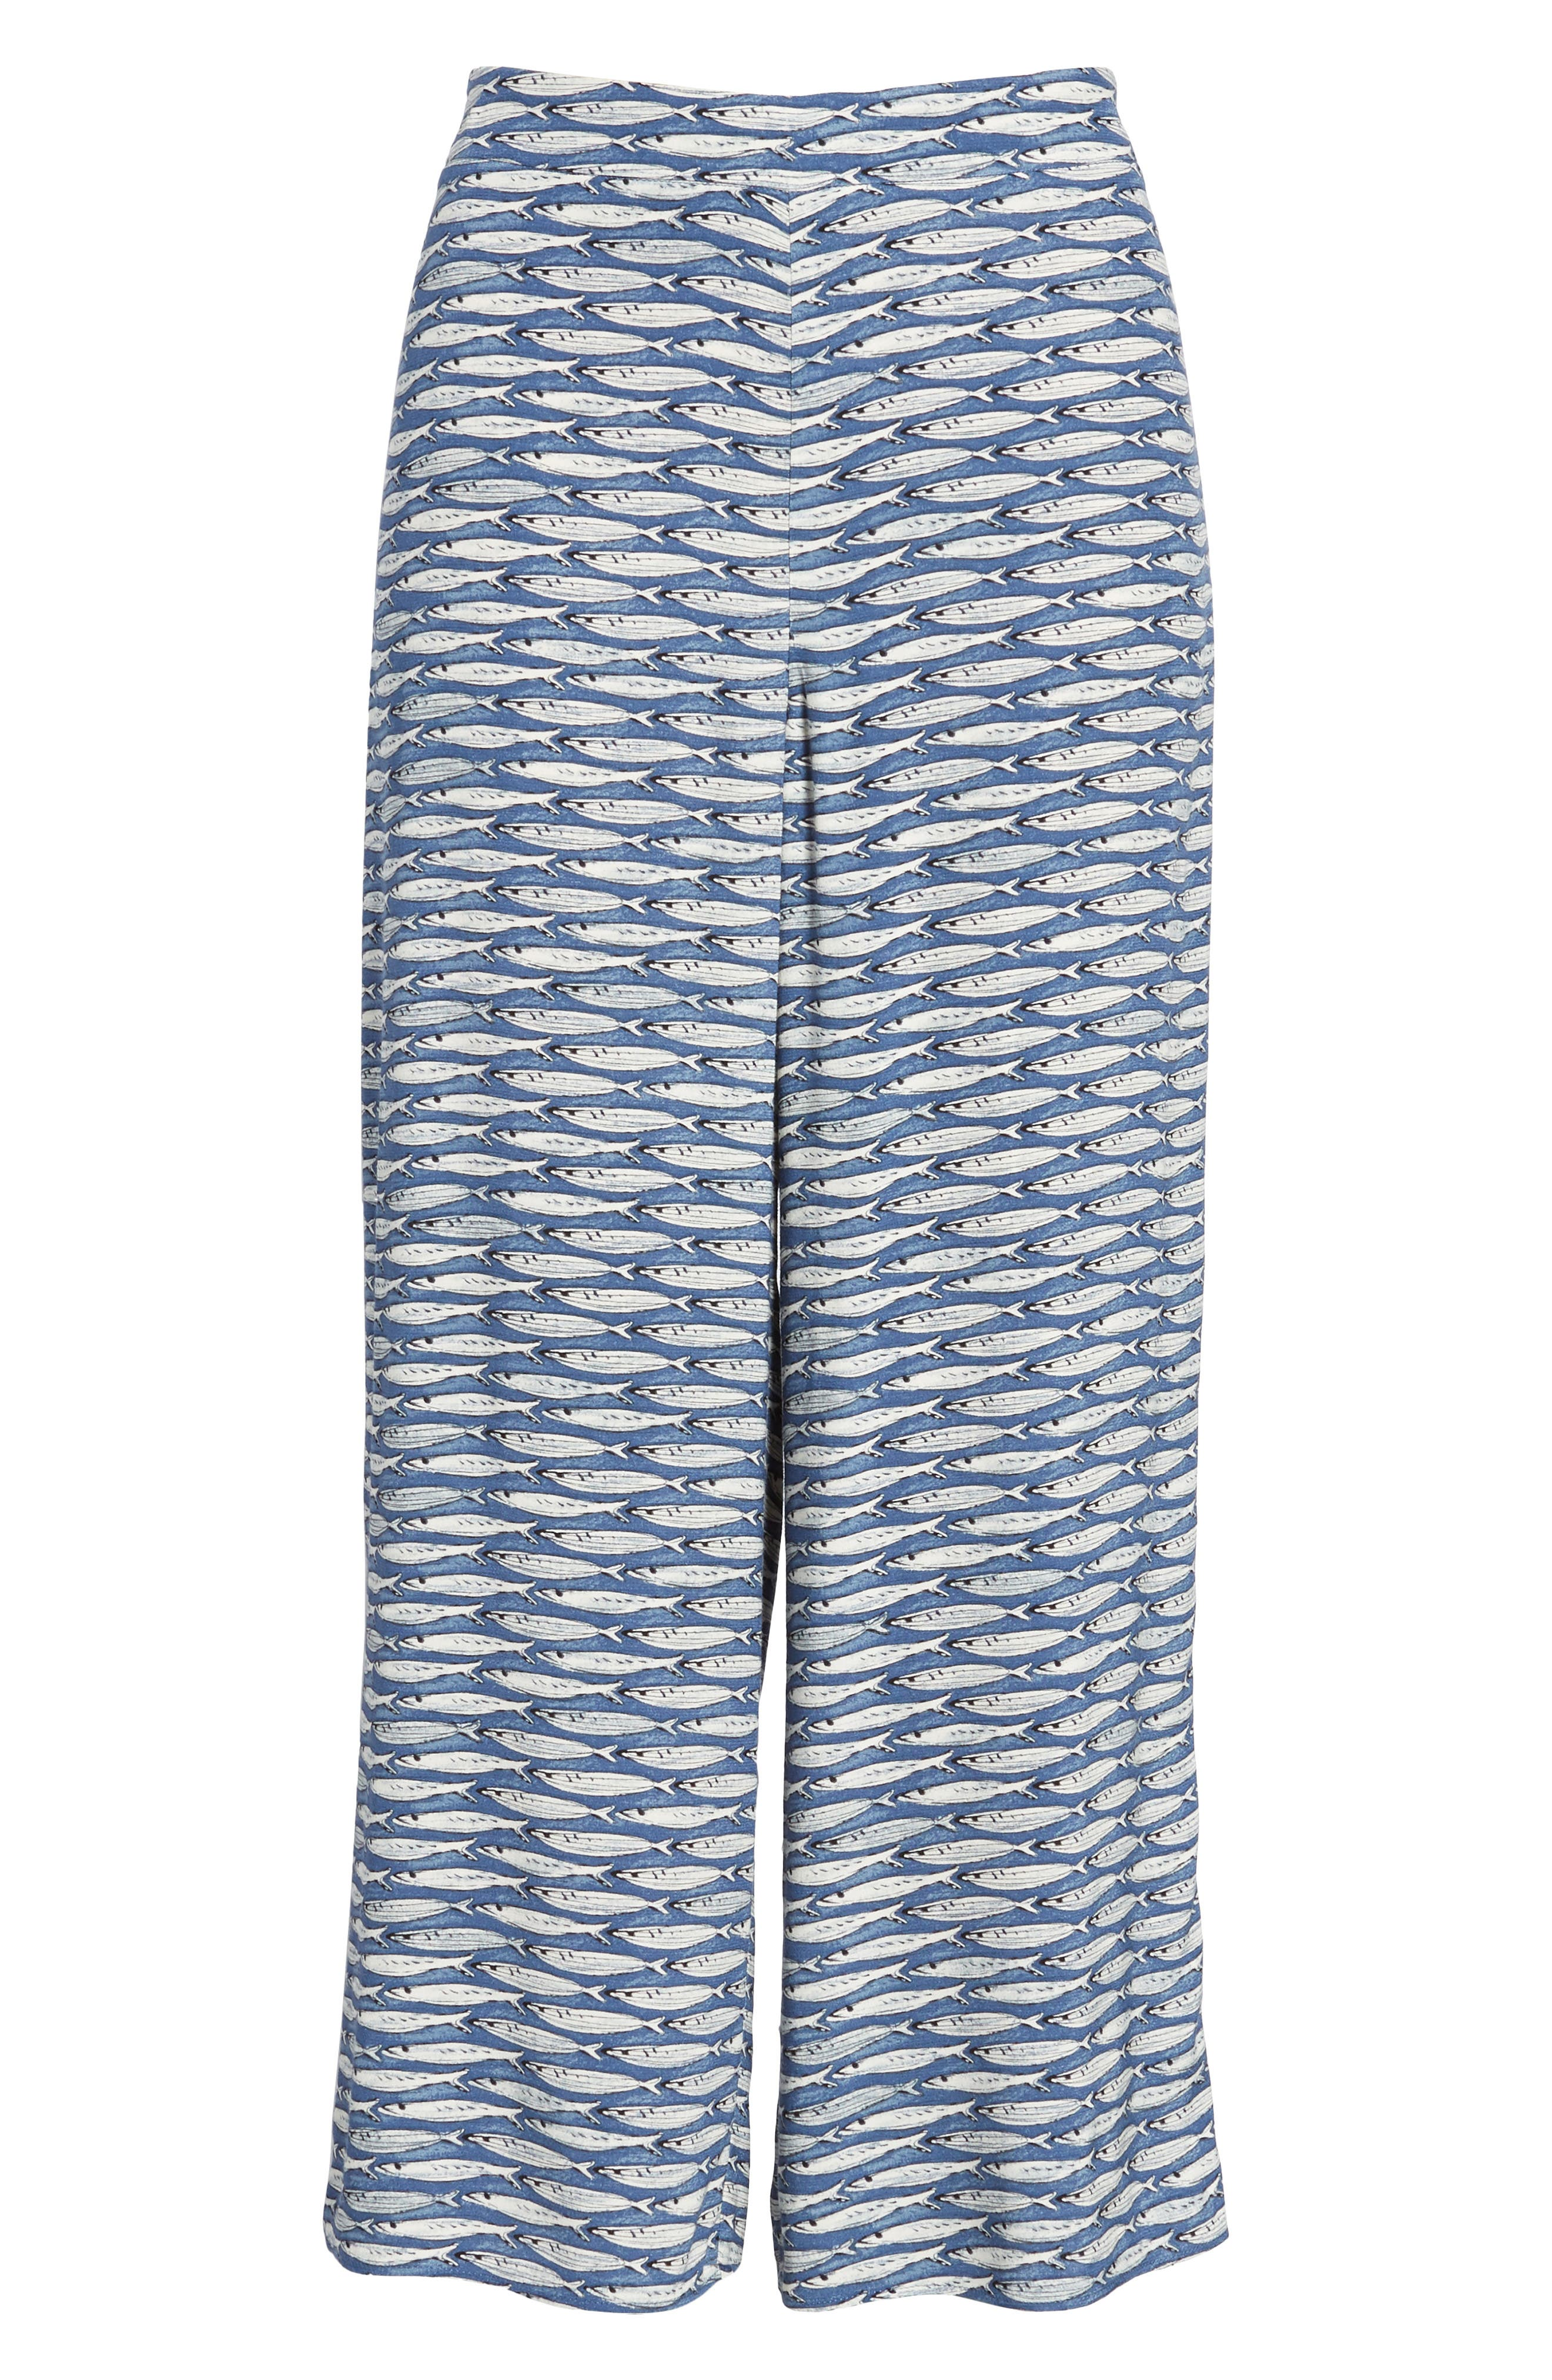 Big Sea Crop Pants,                             Alternate thumbnail 7, color,                             490